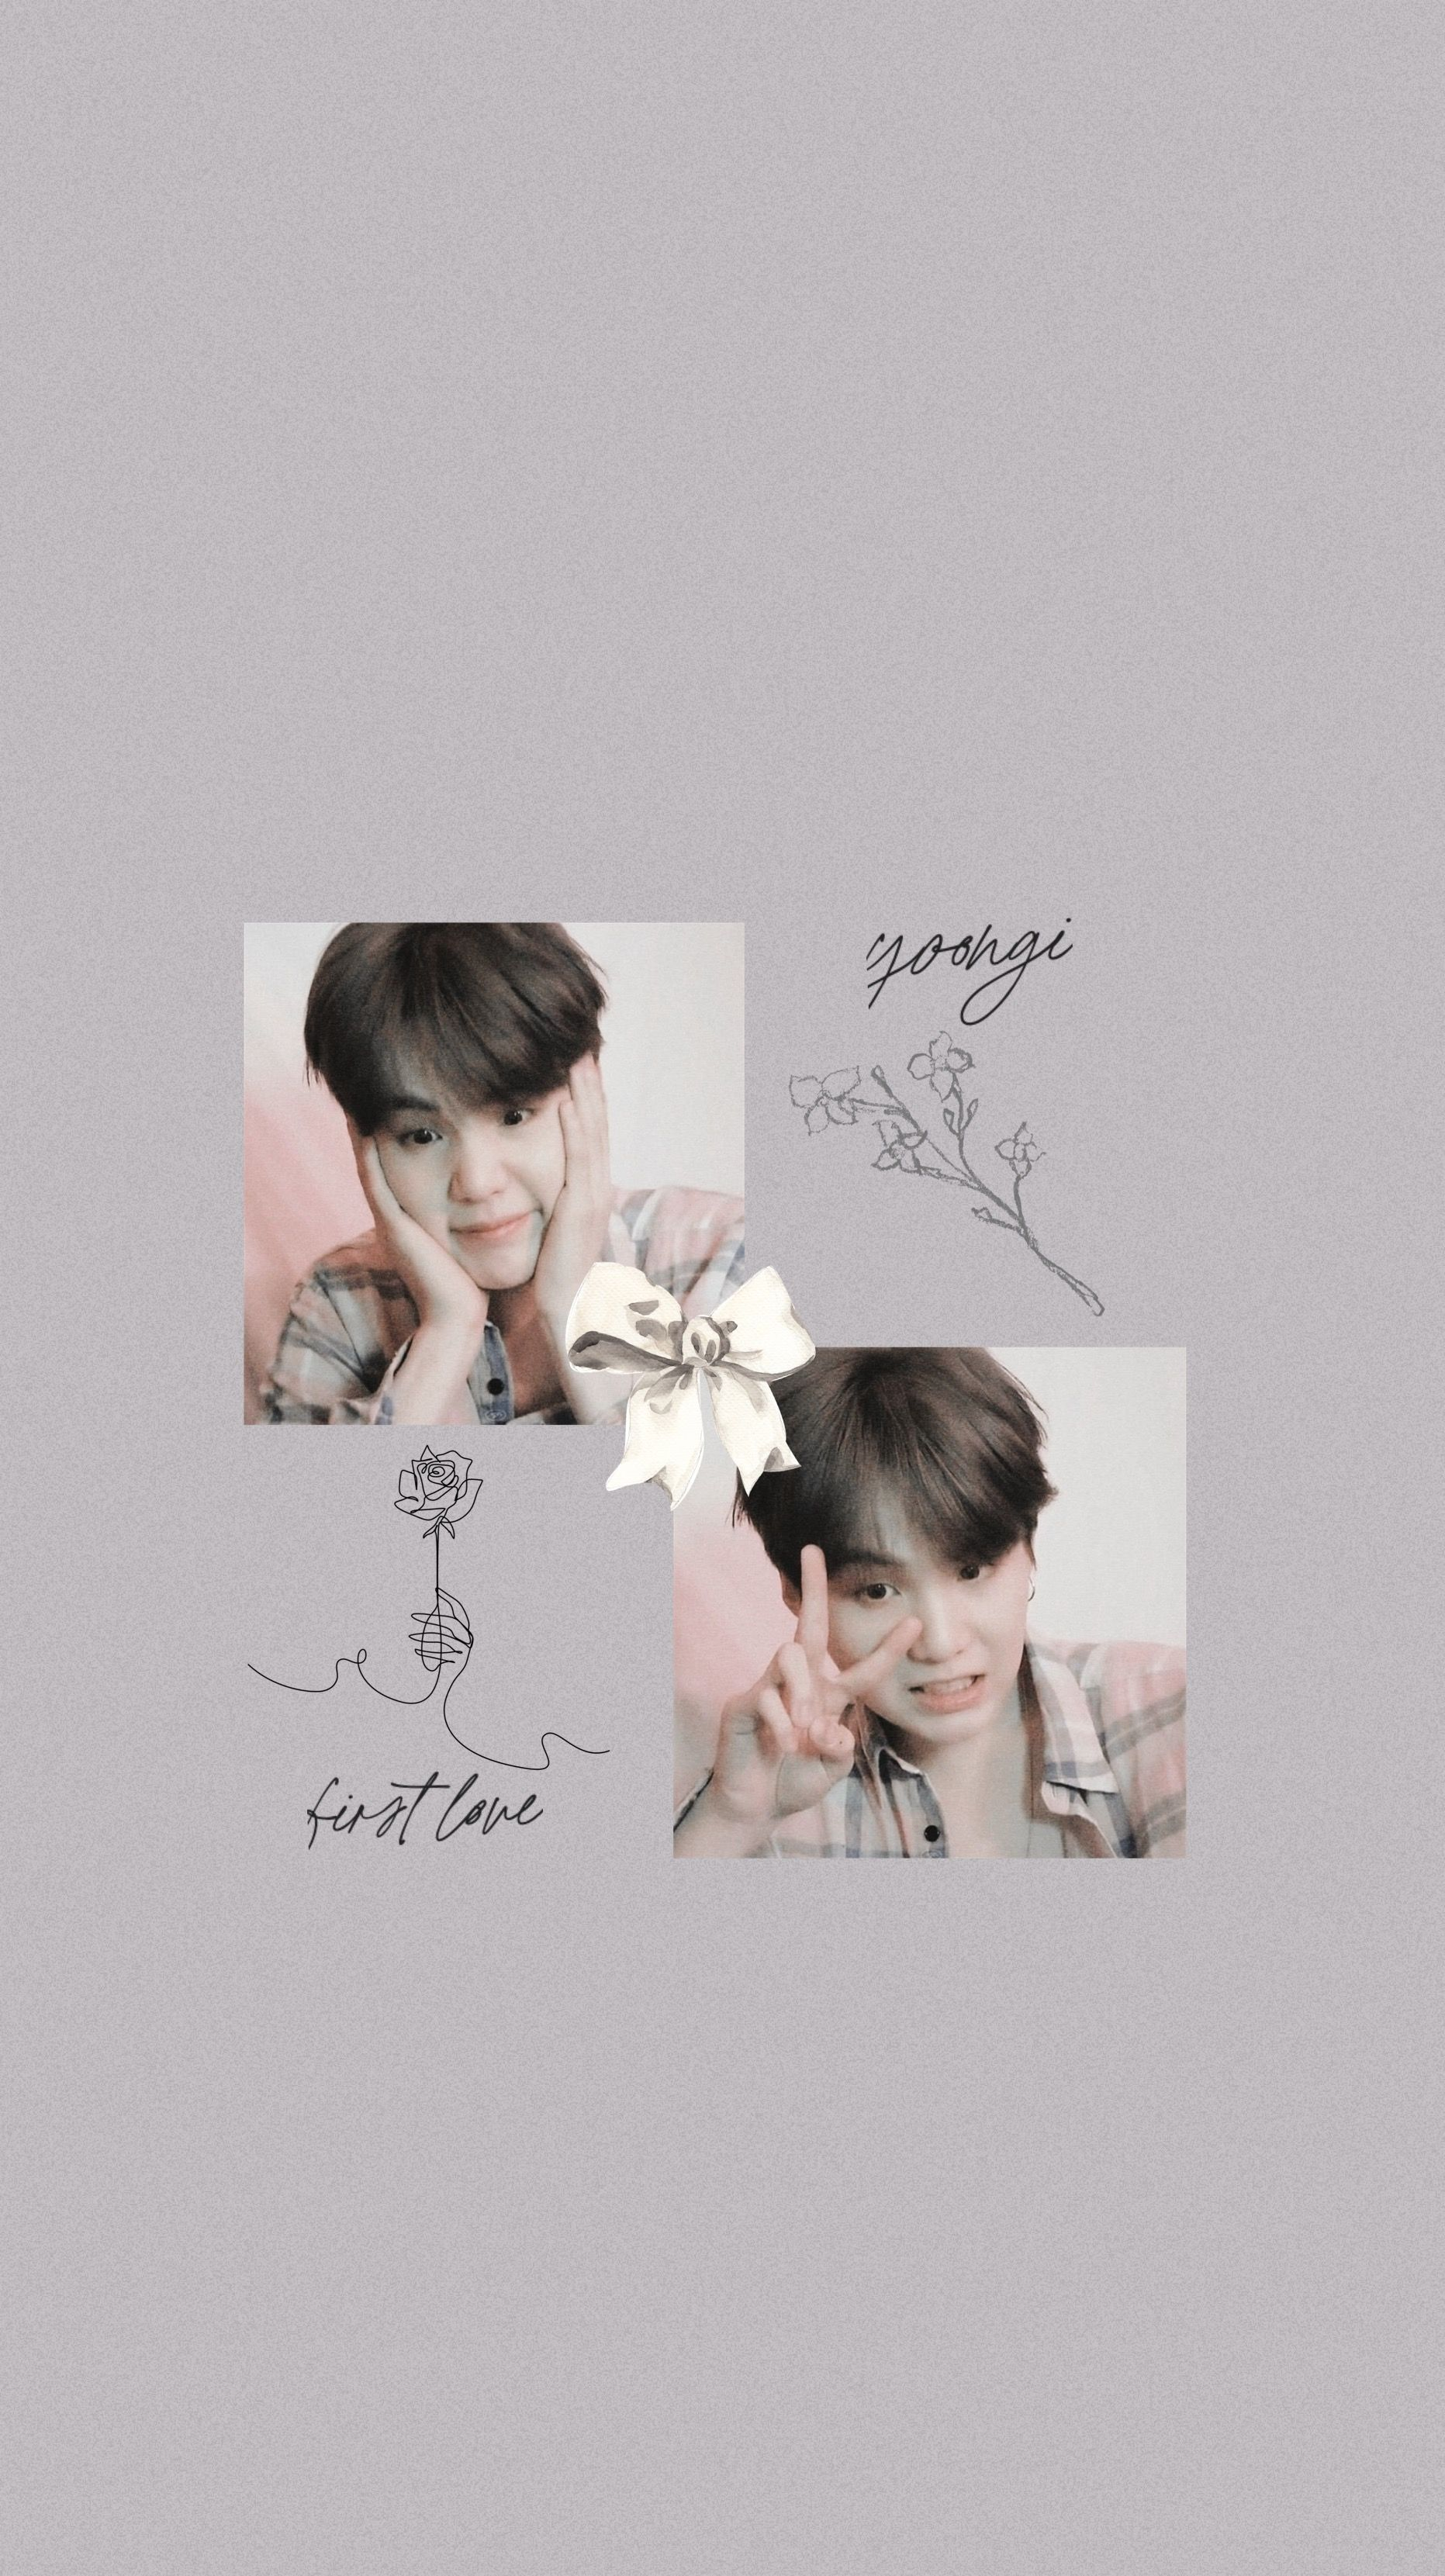 Suga Yoongi Bts Wallpaper Lockscreen Gambar Realistis Gambar Kertas Dinding